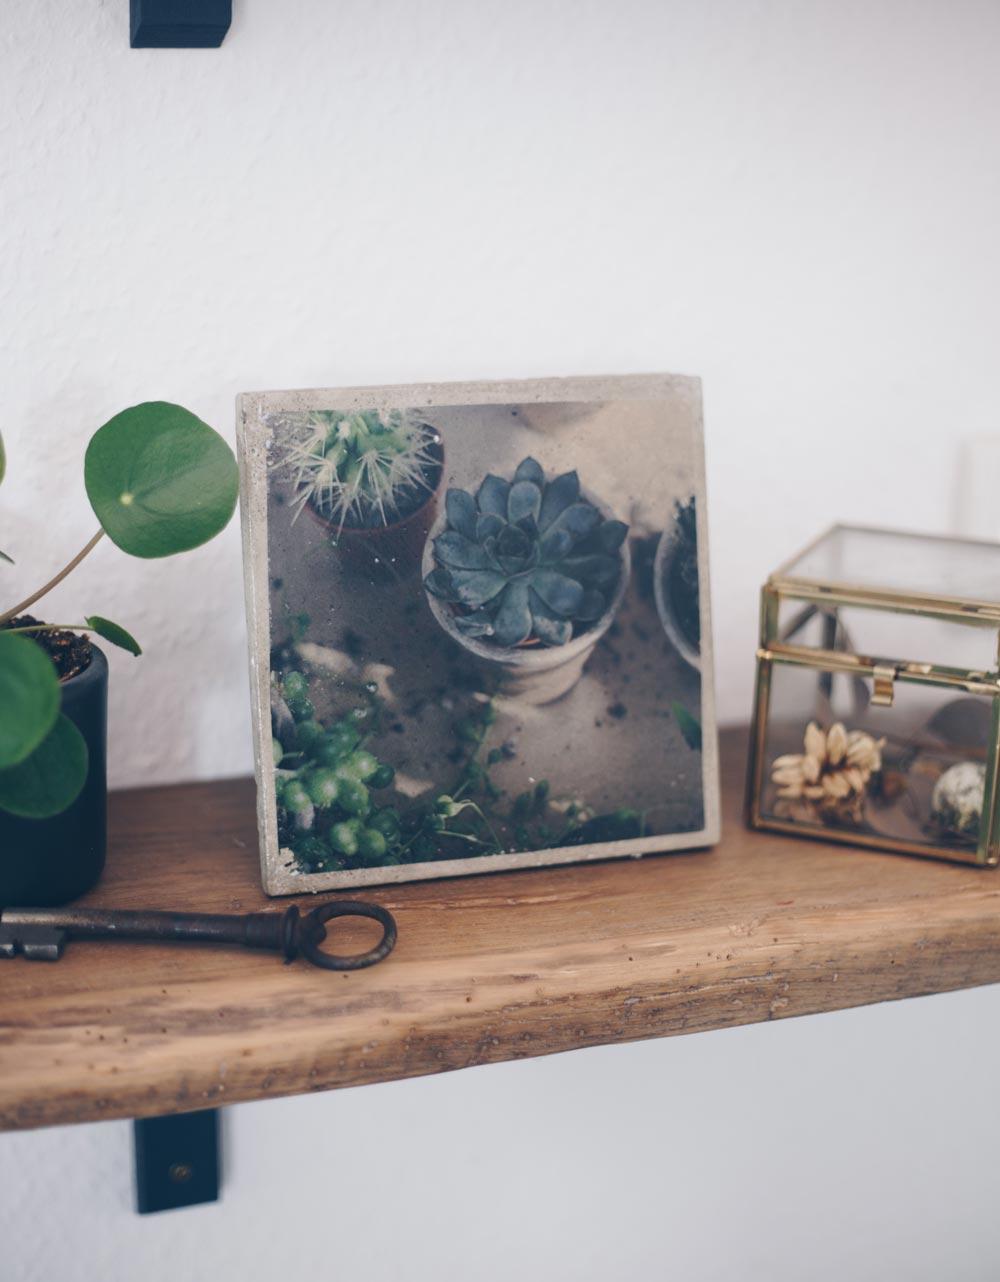 DIY Fototransfer auf Betonfliesen - Betonbilder selbermachen